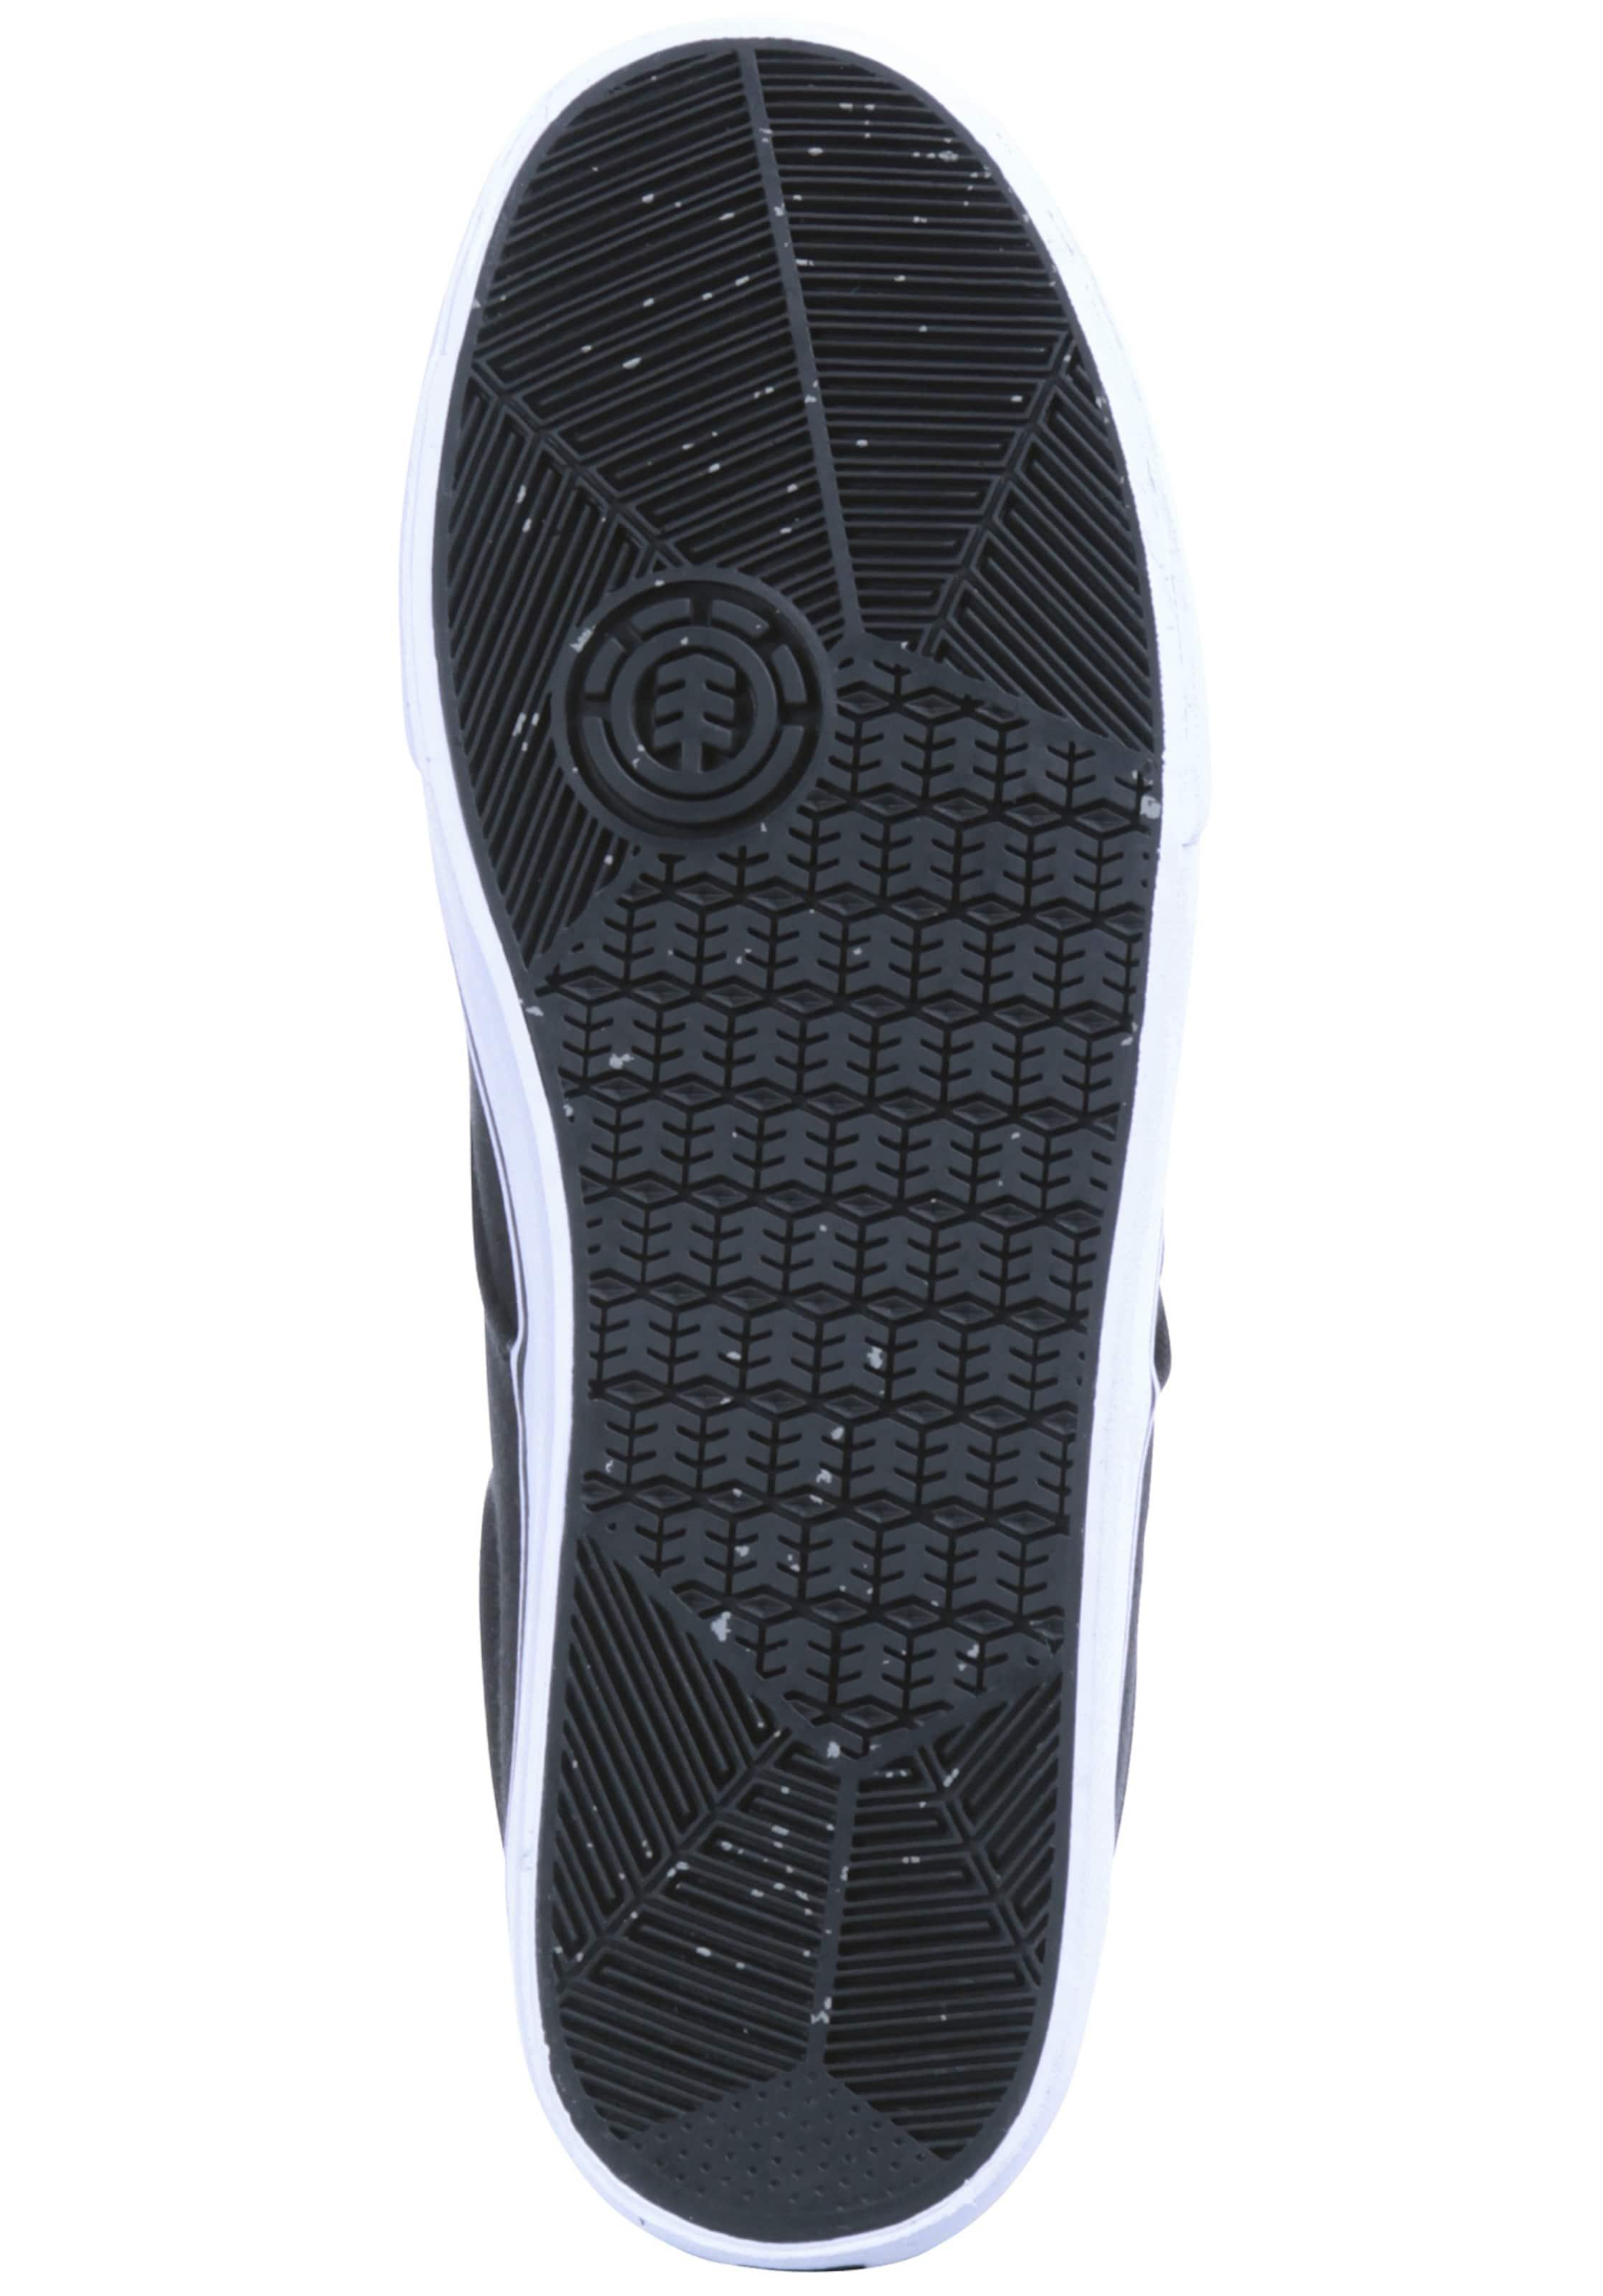 ELEMENT 'Topaz C3' Turnschuhe Textil Bequem, gut aussehend aussehend aussehend d9d847